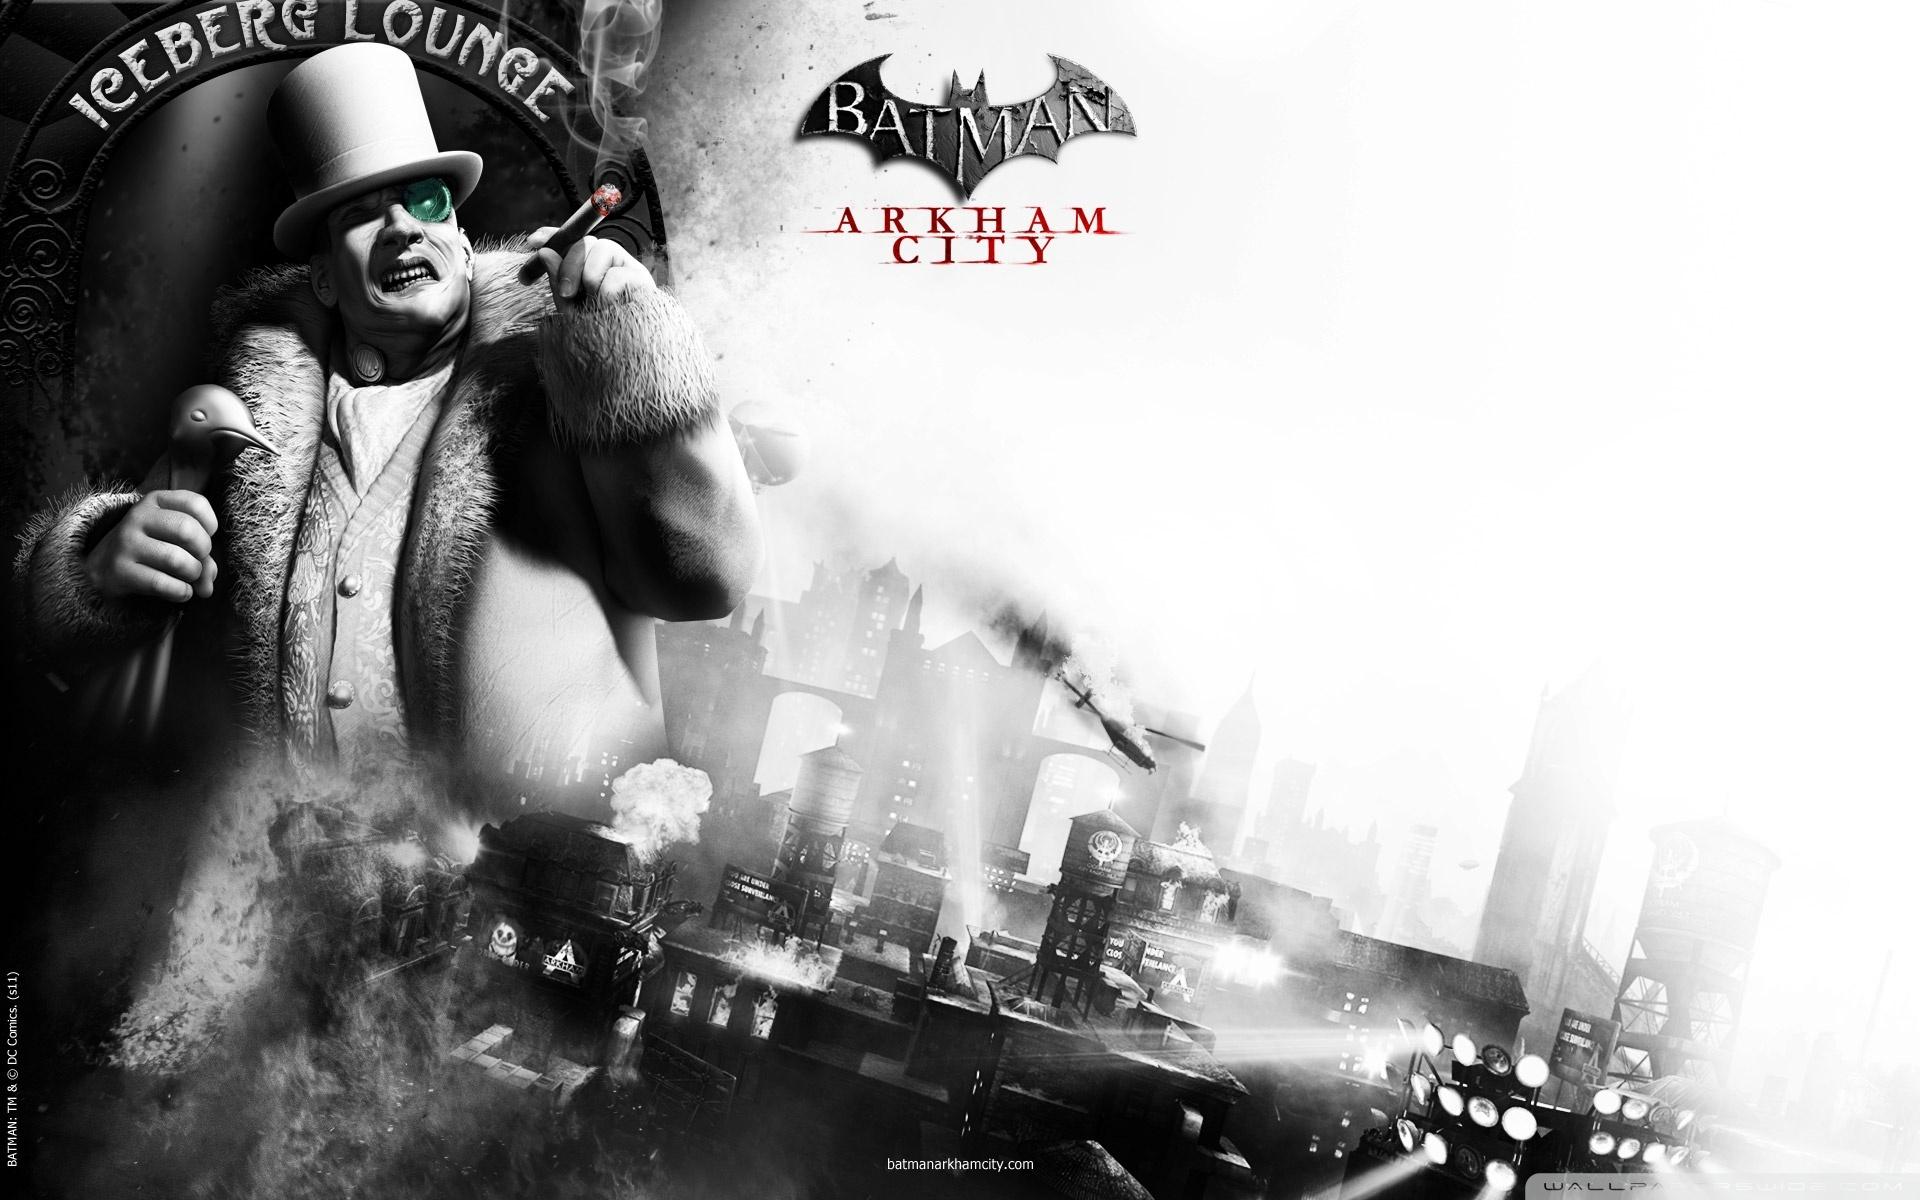 Batman Arkham City The Penguin 4K HD Desktop Wallpaper for 1920x1200